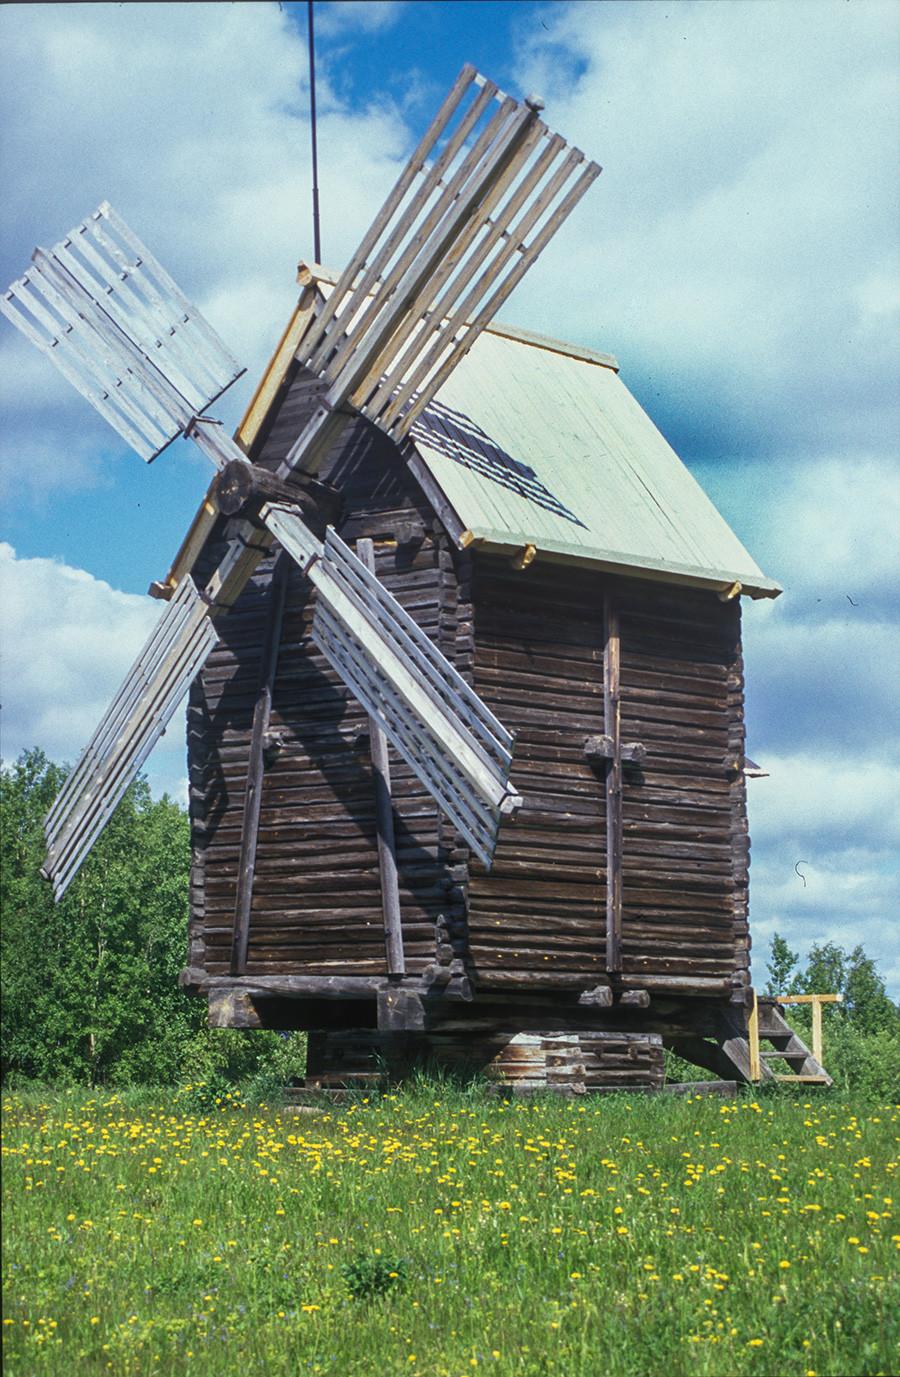 Malye Korely Museum. Post windmill originally at Kalgachikha village. Mill structure turns on low base. June 23, 2003